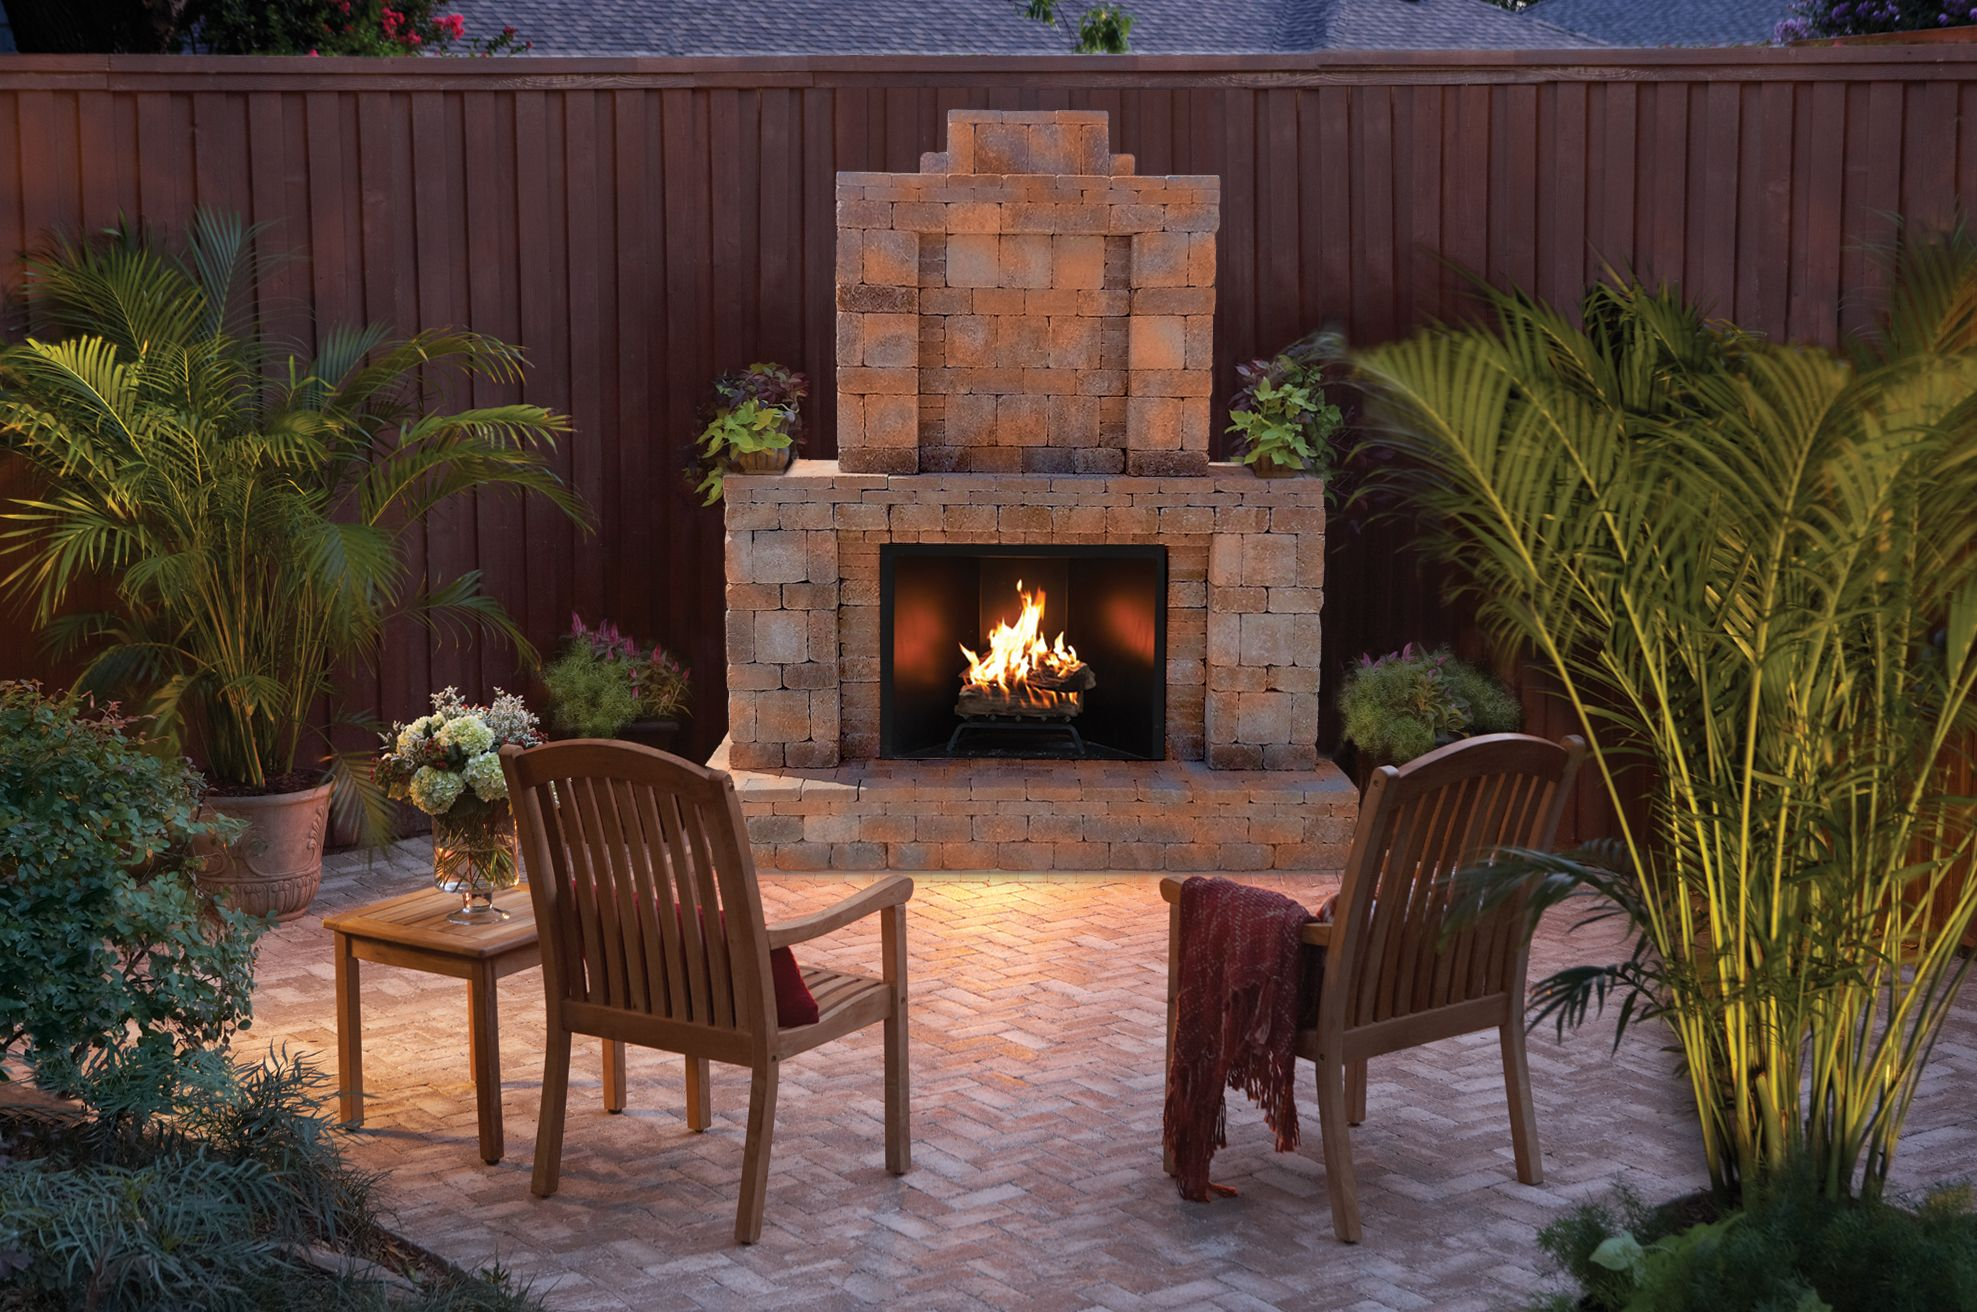 A Beautiful Rumblestone Outdoor Fireplace #Diy